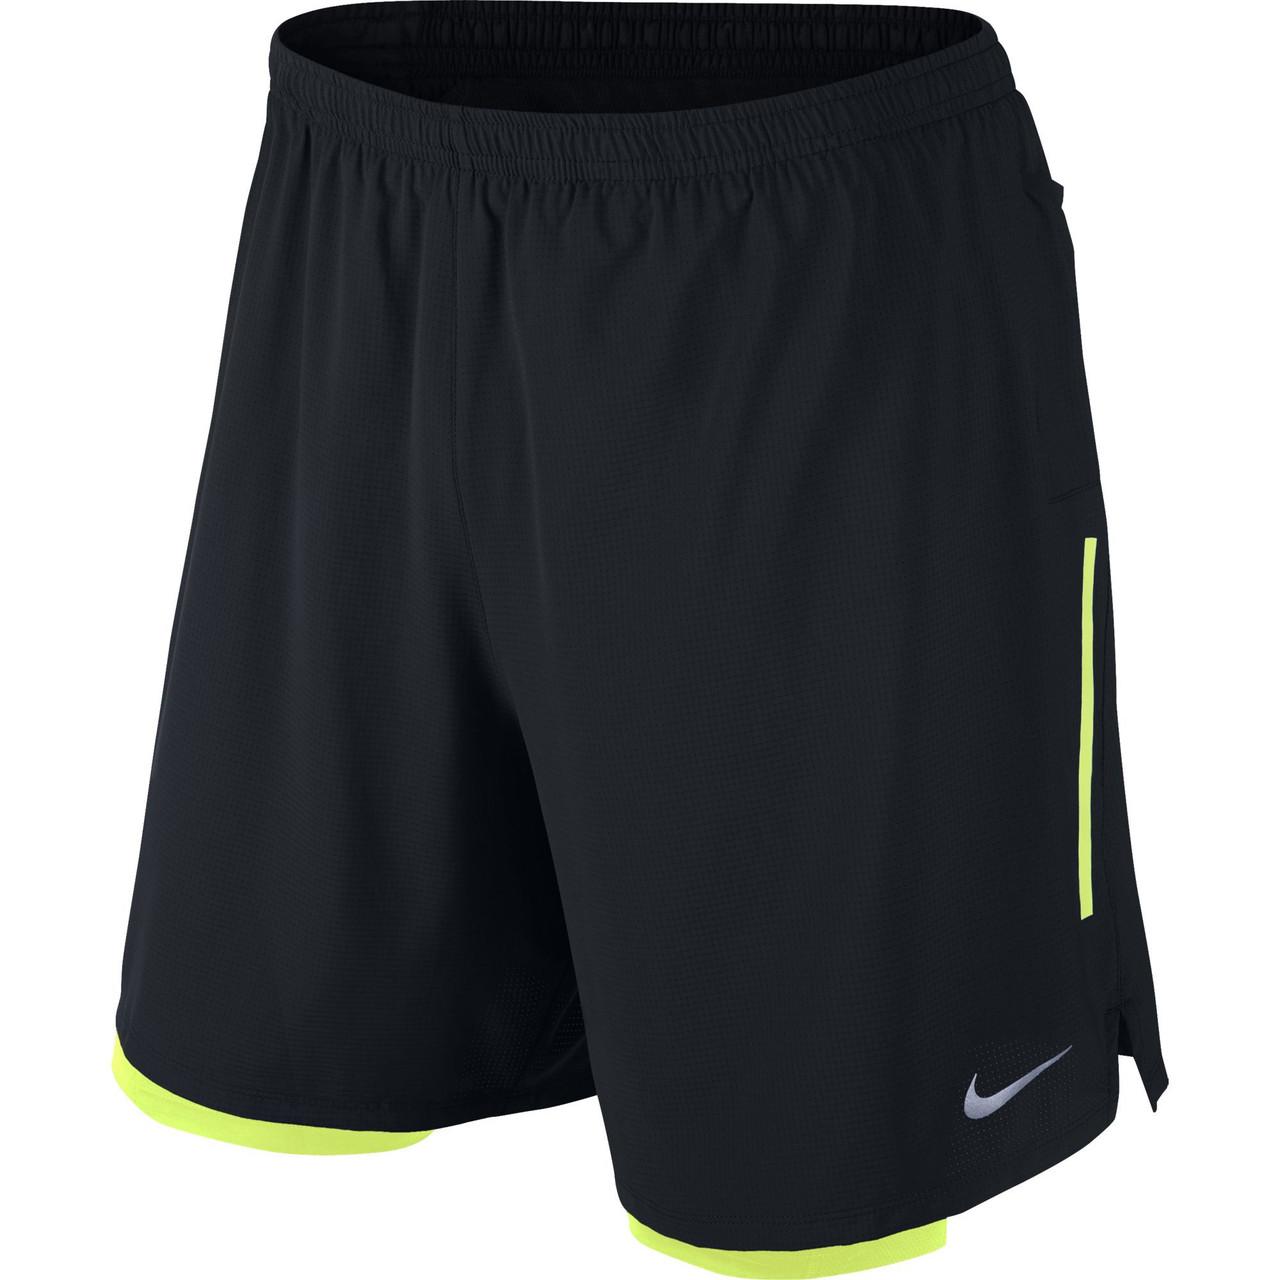 811261be Купить Мужские шорты Nike 7 phenom 2-in-1 short (Артикул: 683279-010 ...